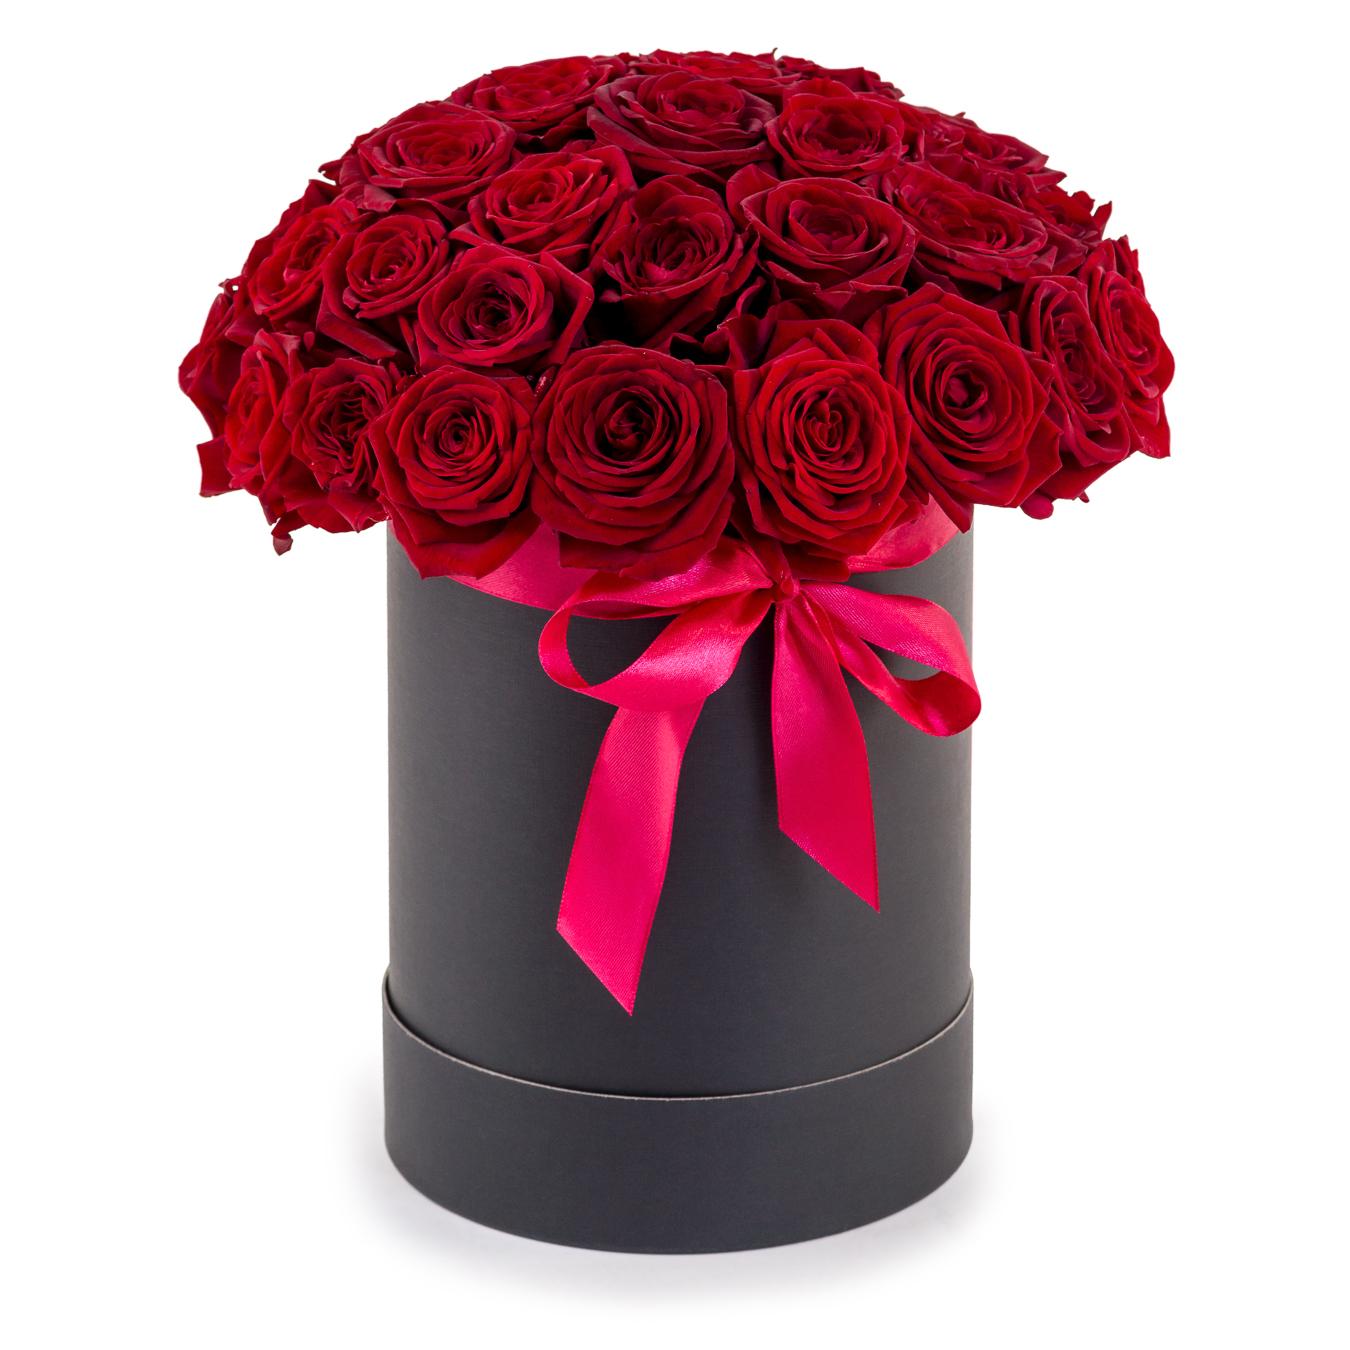 Антрацит<br>Ингредиенты: Оазис 2 шт, Роза (50 см) 39 шт, Коробка флобокс 1 шт;